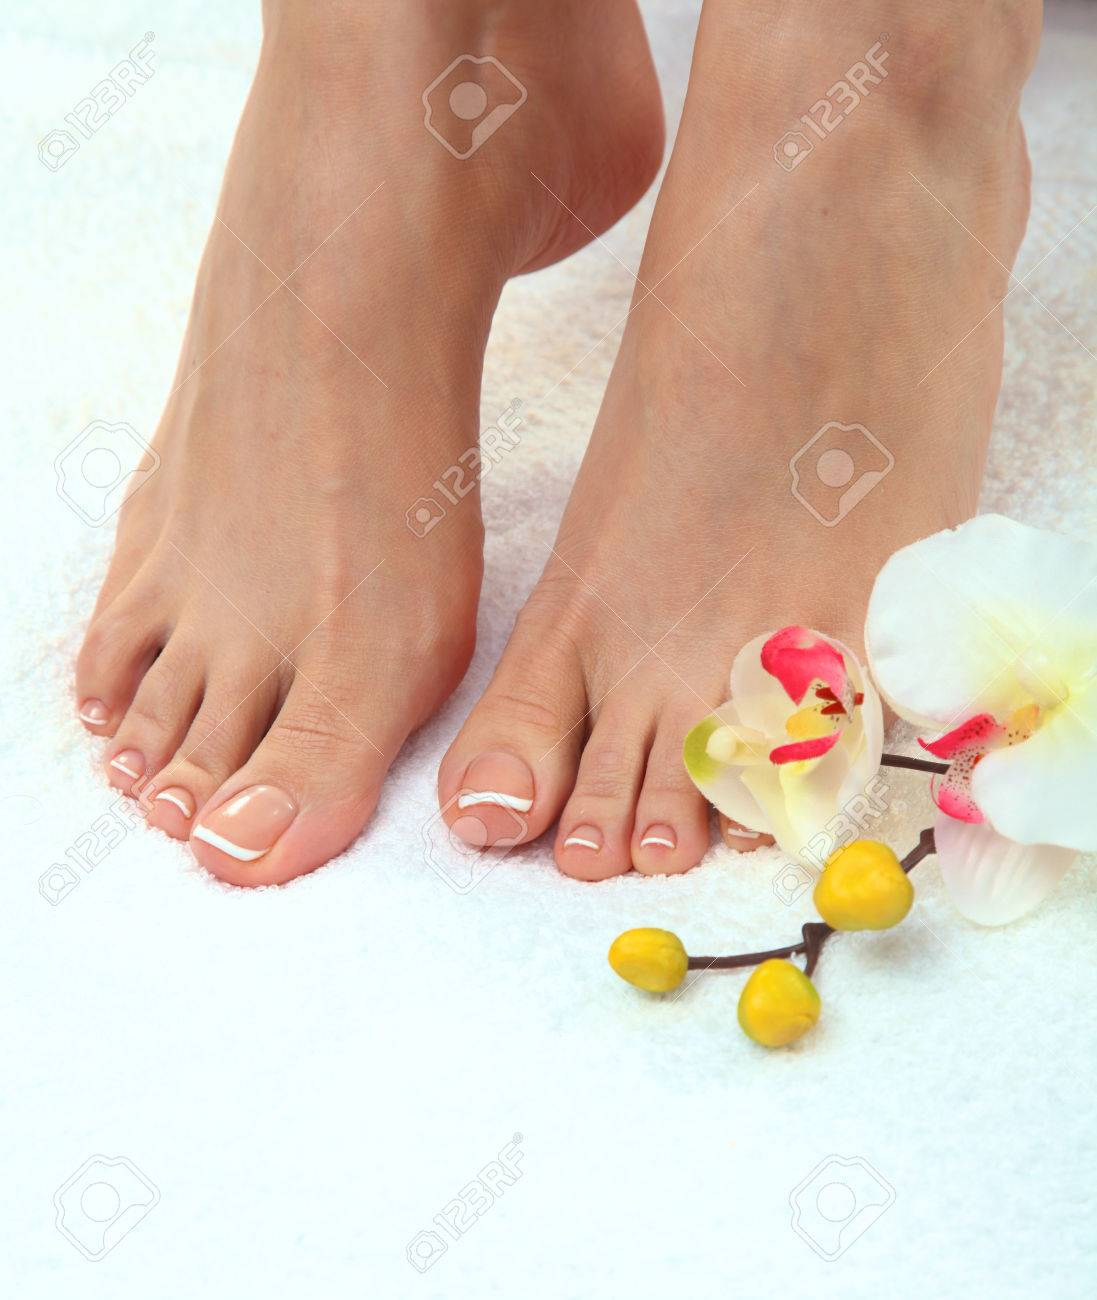 pied gros